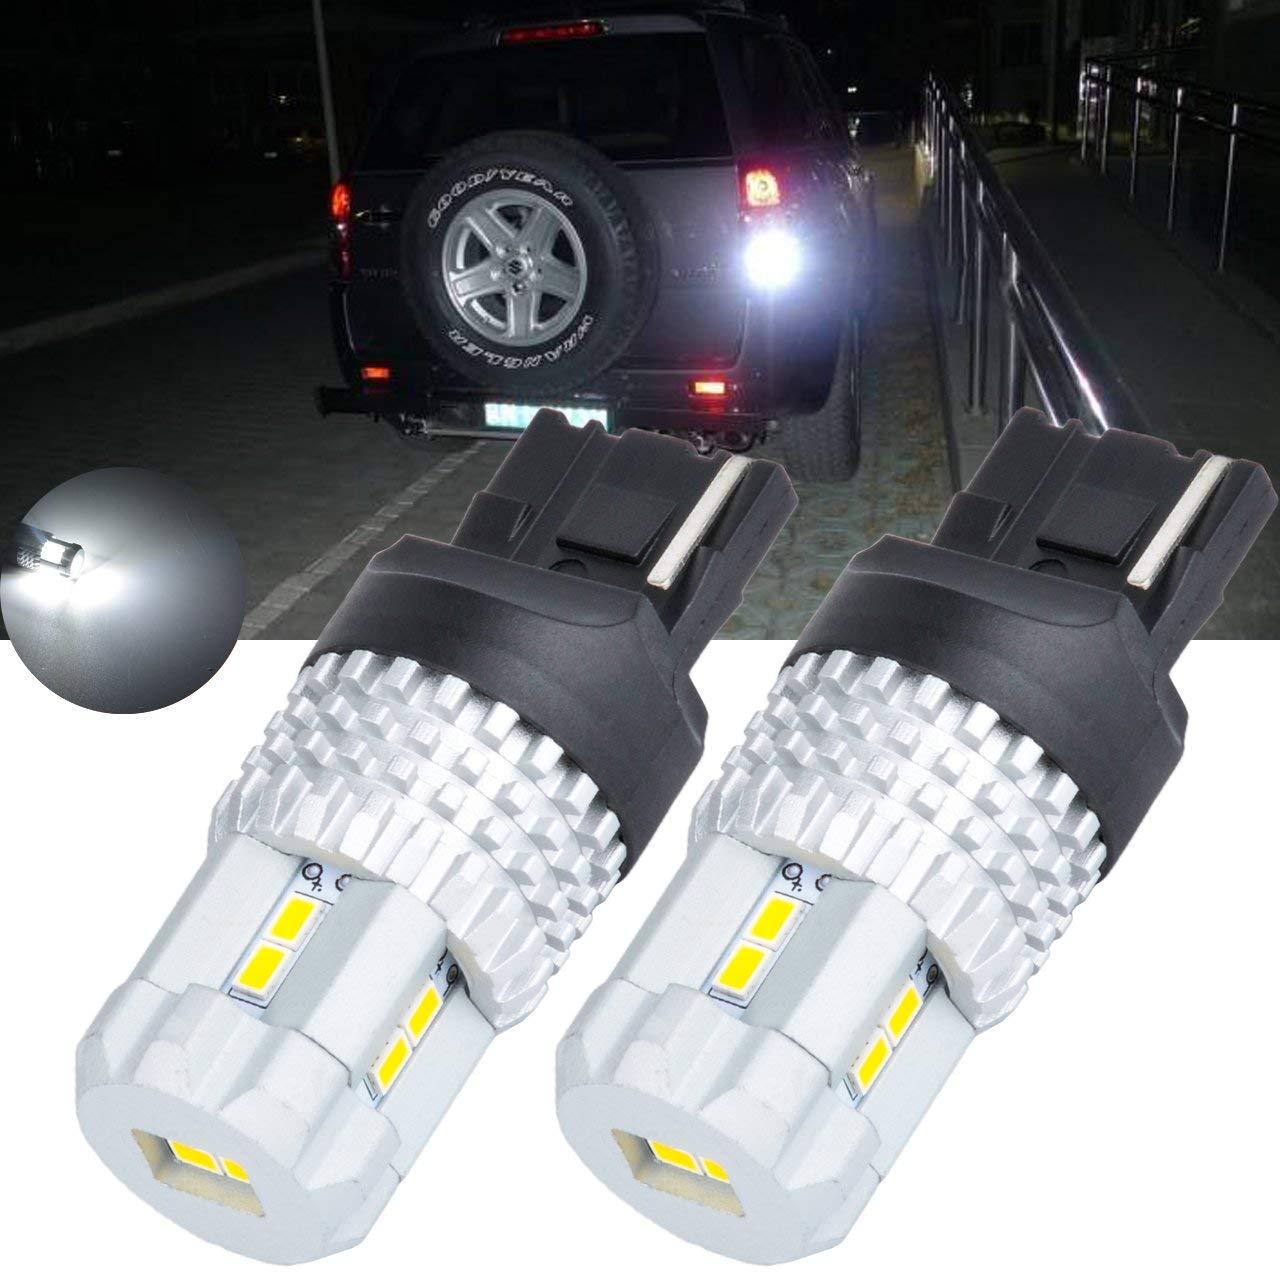 To Make Car Led Bulb Using 3020 Smd Leds Electronic Circuit Projects